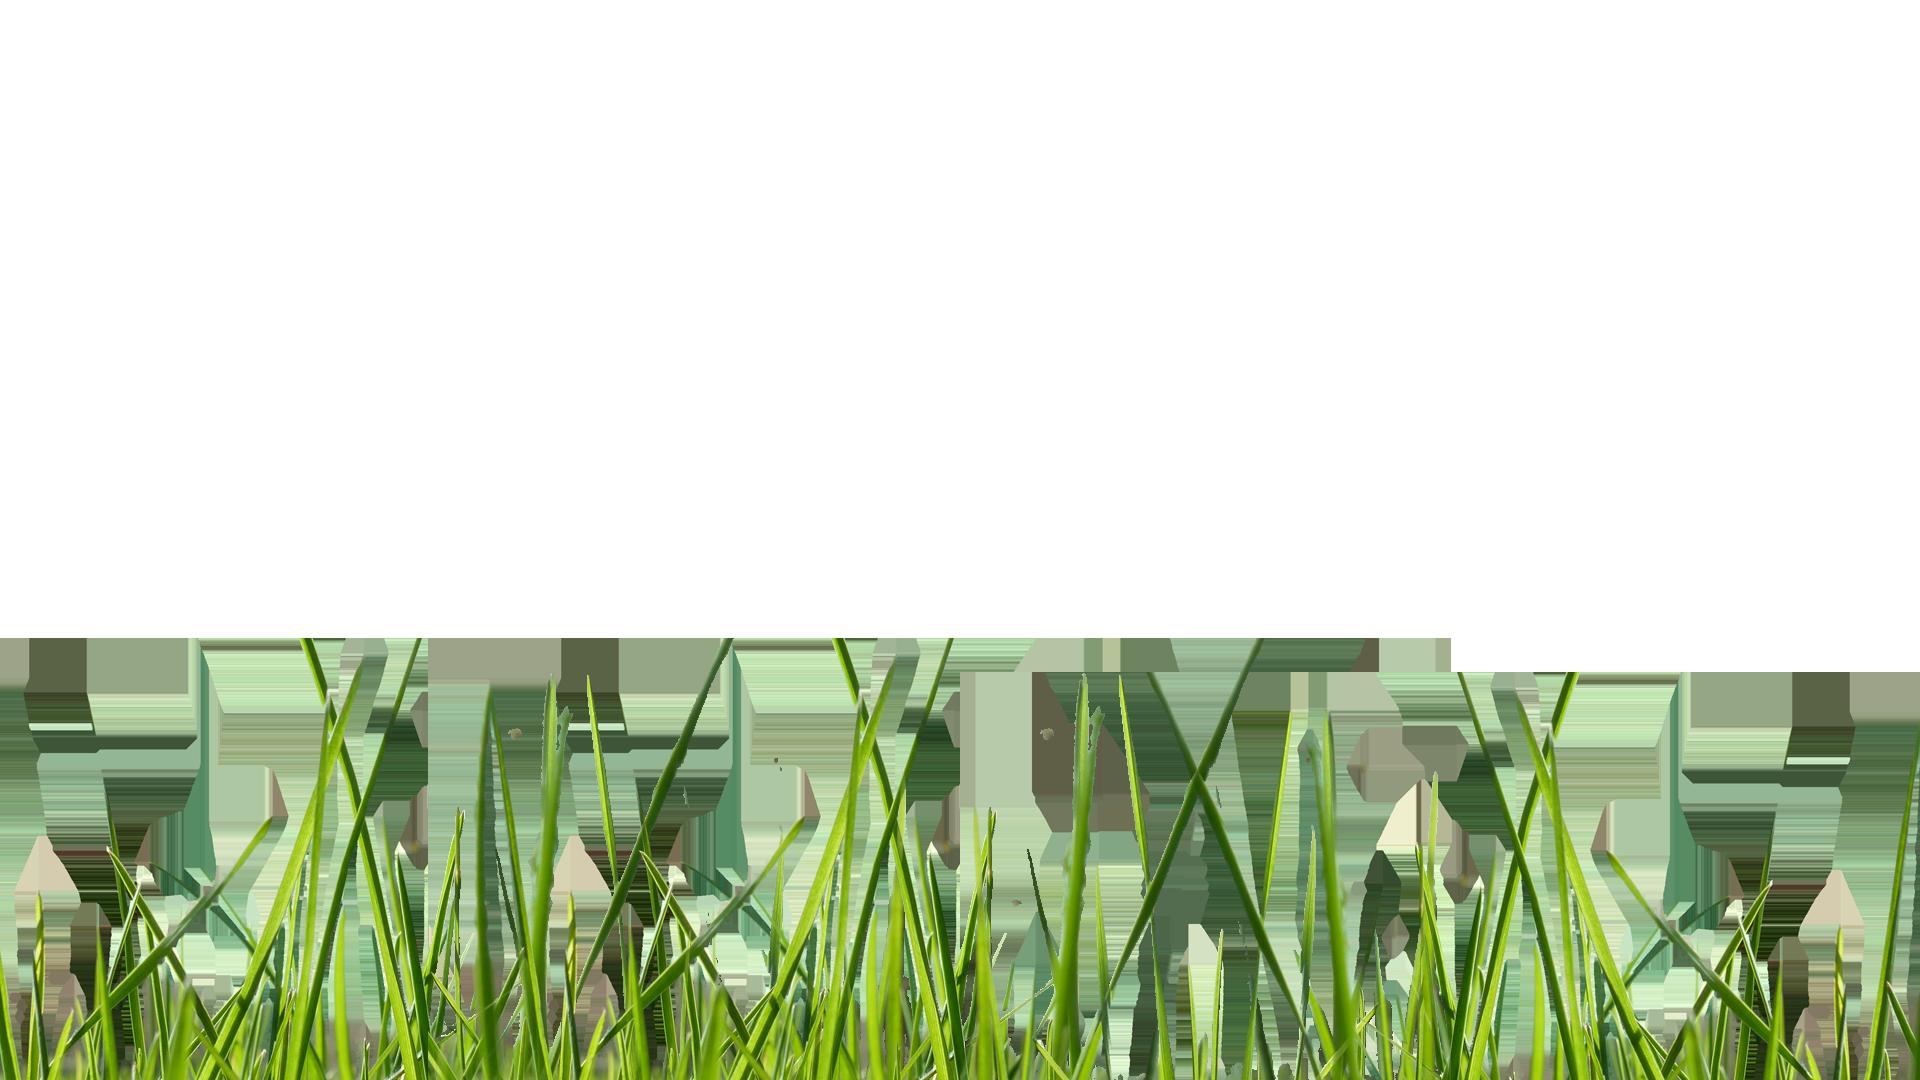 Jardinier paysagiste avignon lagage et abattage d for Elagage entretien jardin